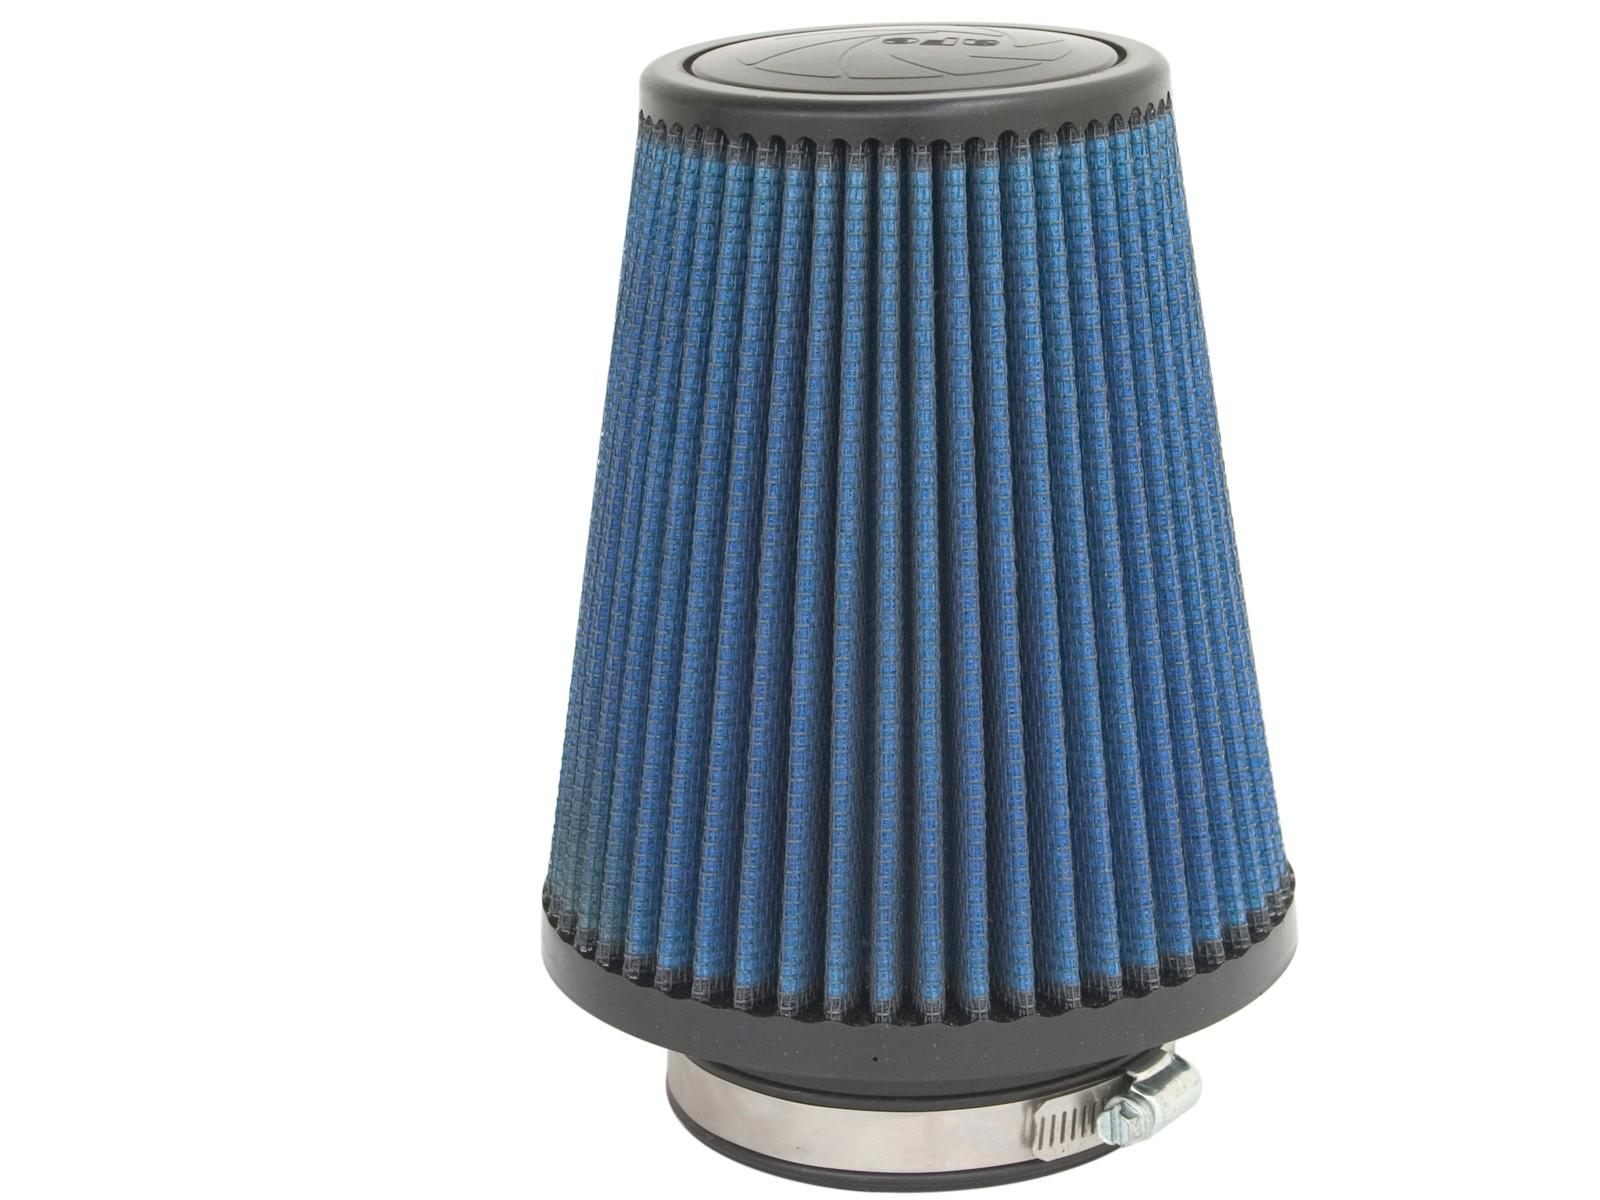 aFe POWER 24-35007 Magnum FLOW Pro 5R Air Filter